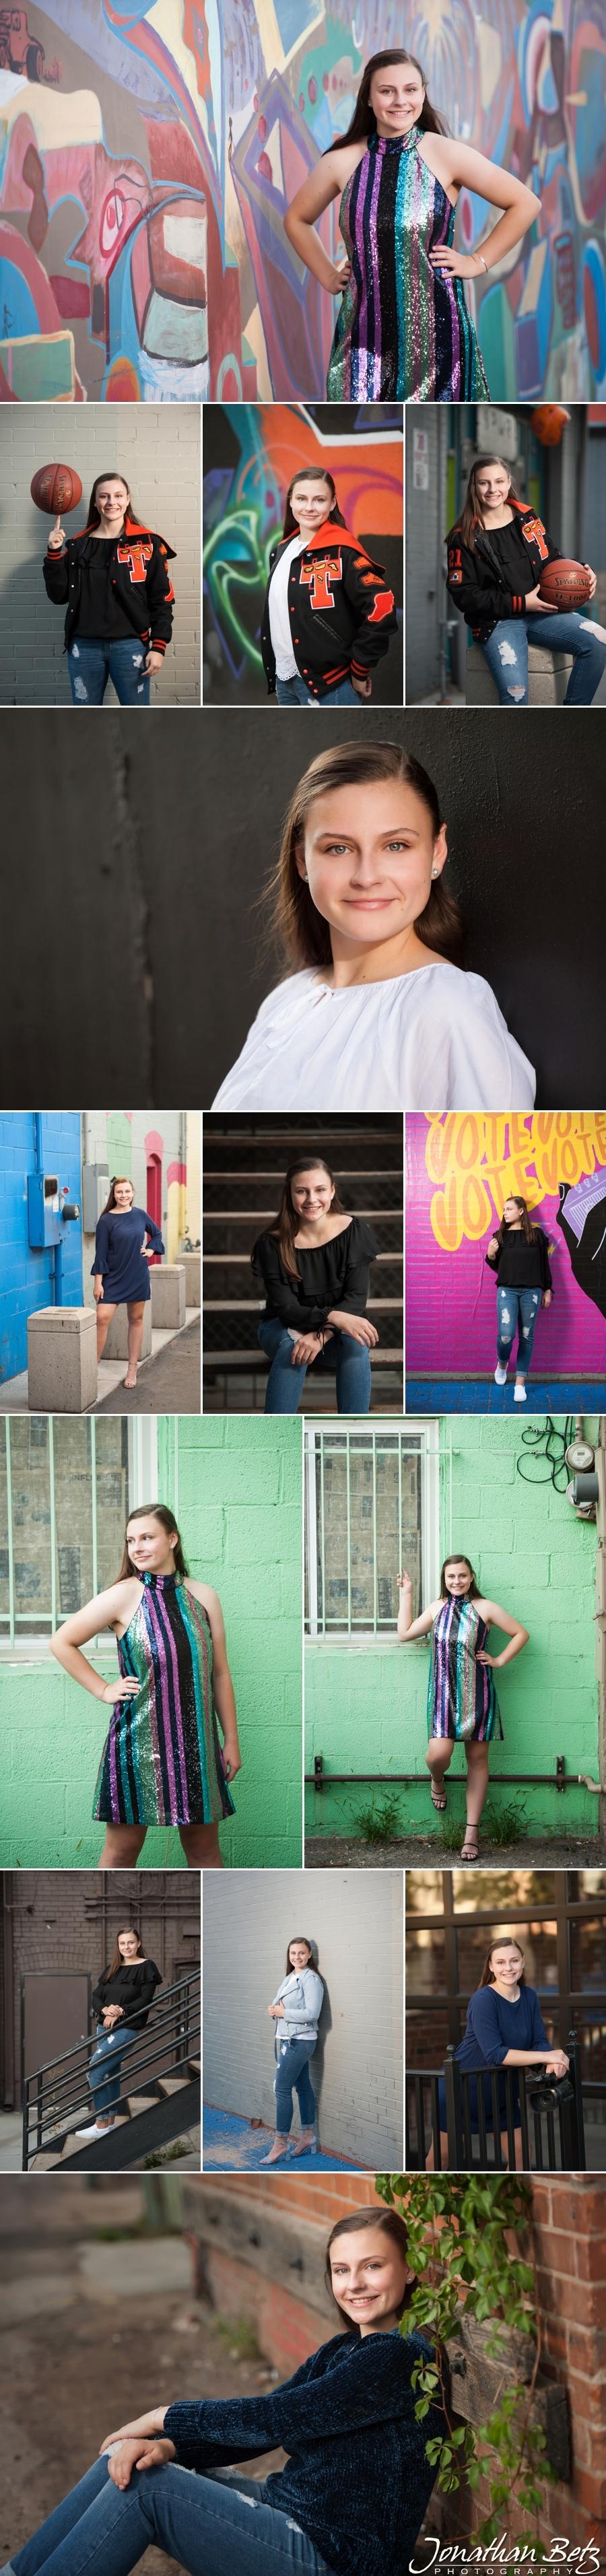 high school senior portraits Jonathan Betz Photography Colorado Springs Professional Photographer